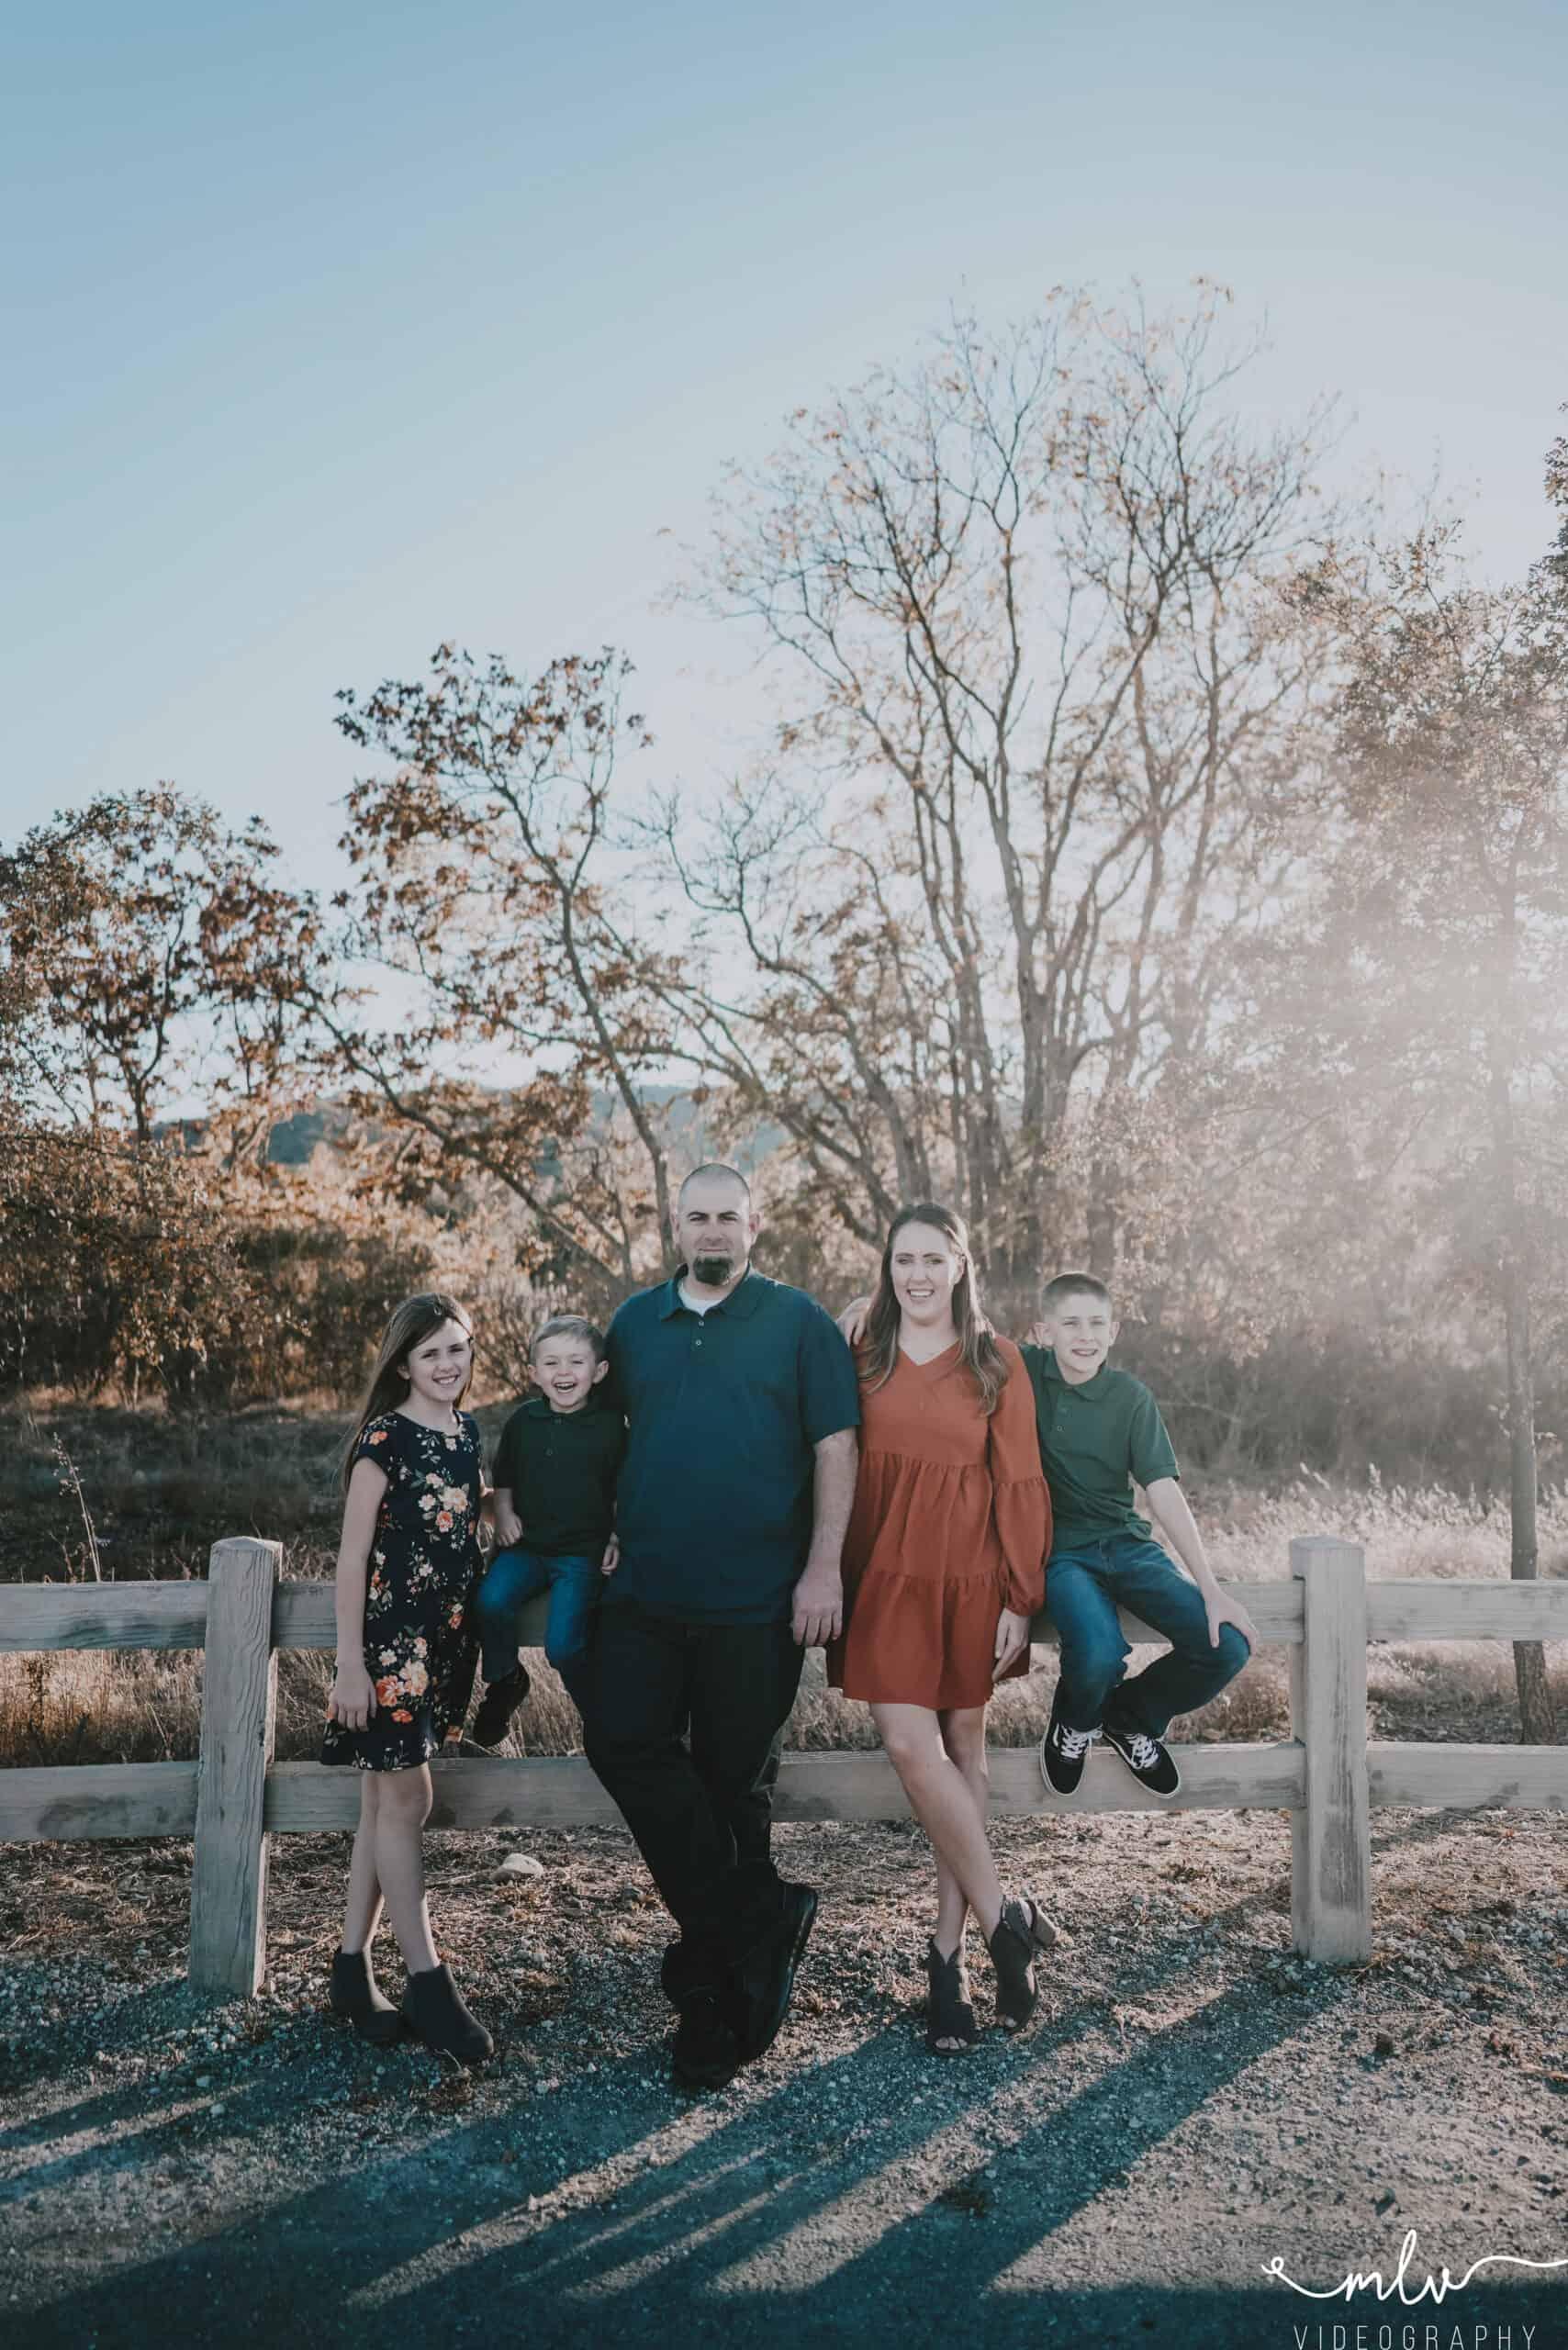 Family photographer in gilroy california